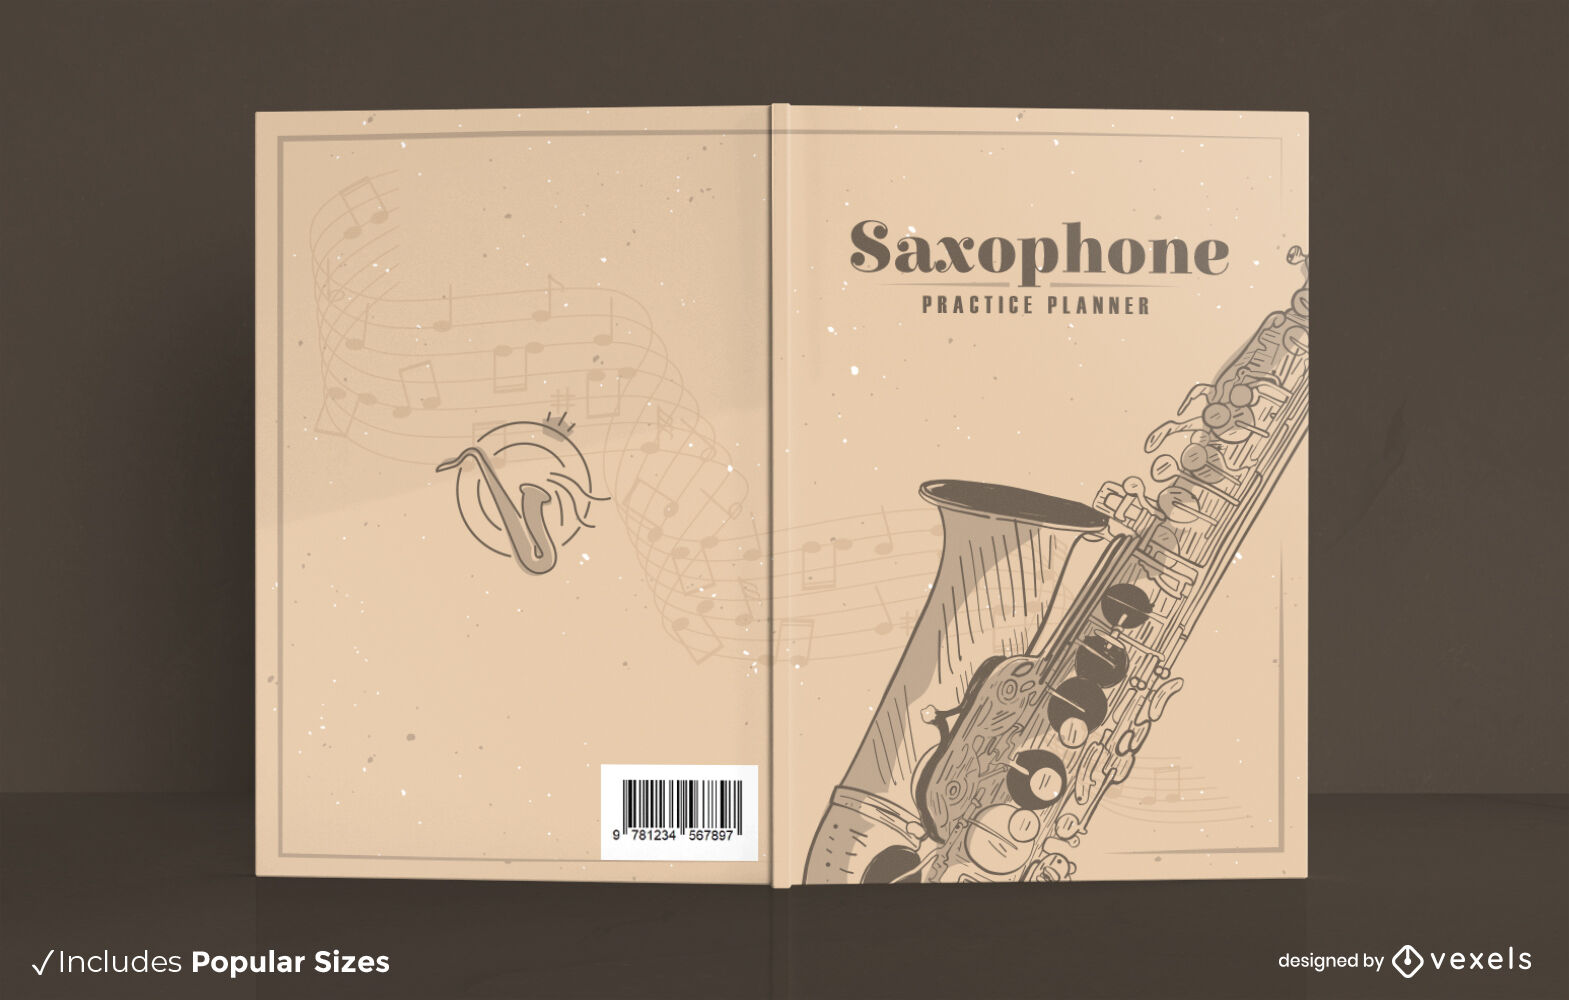 Saxophone music instrument book cover design